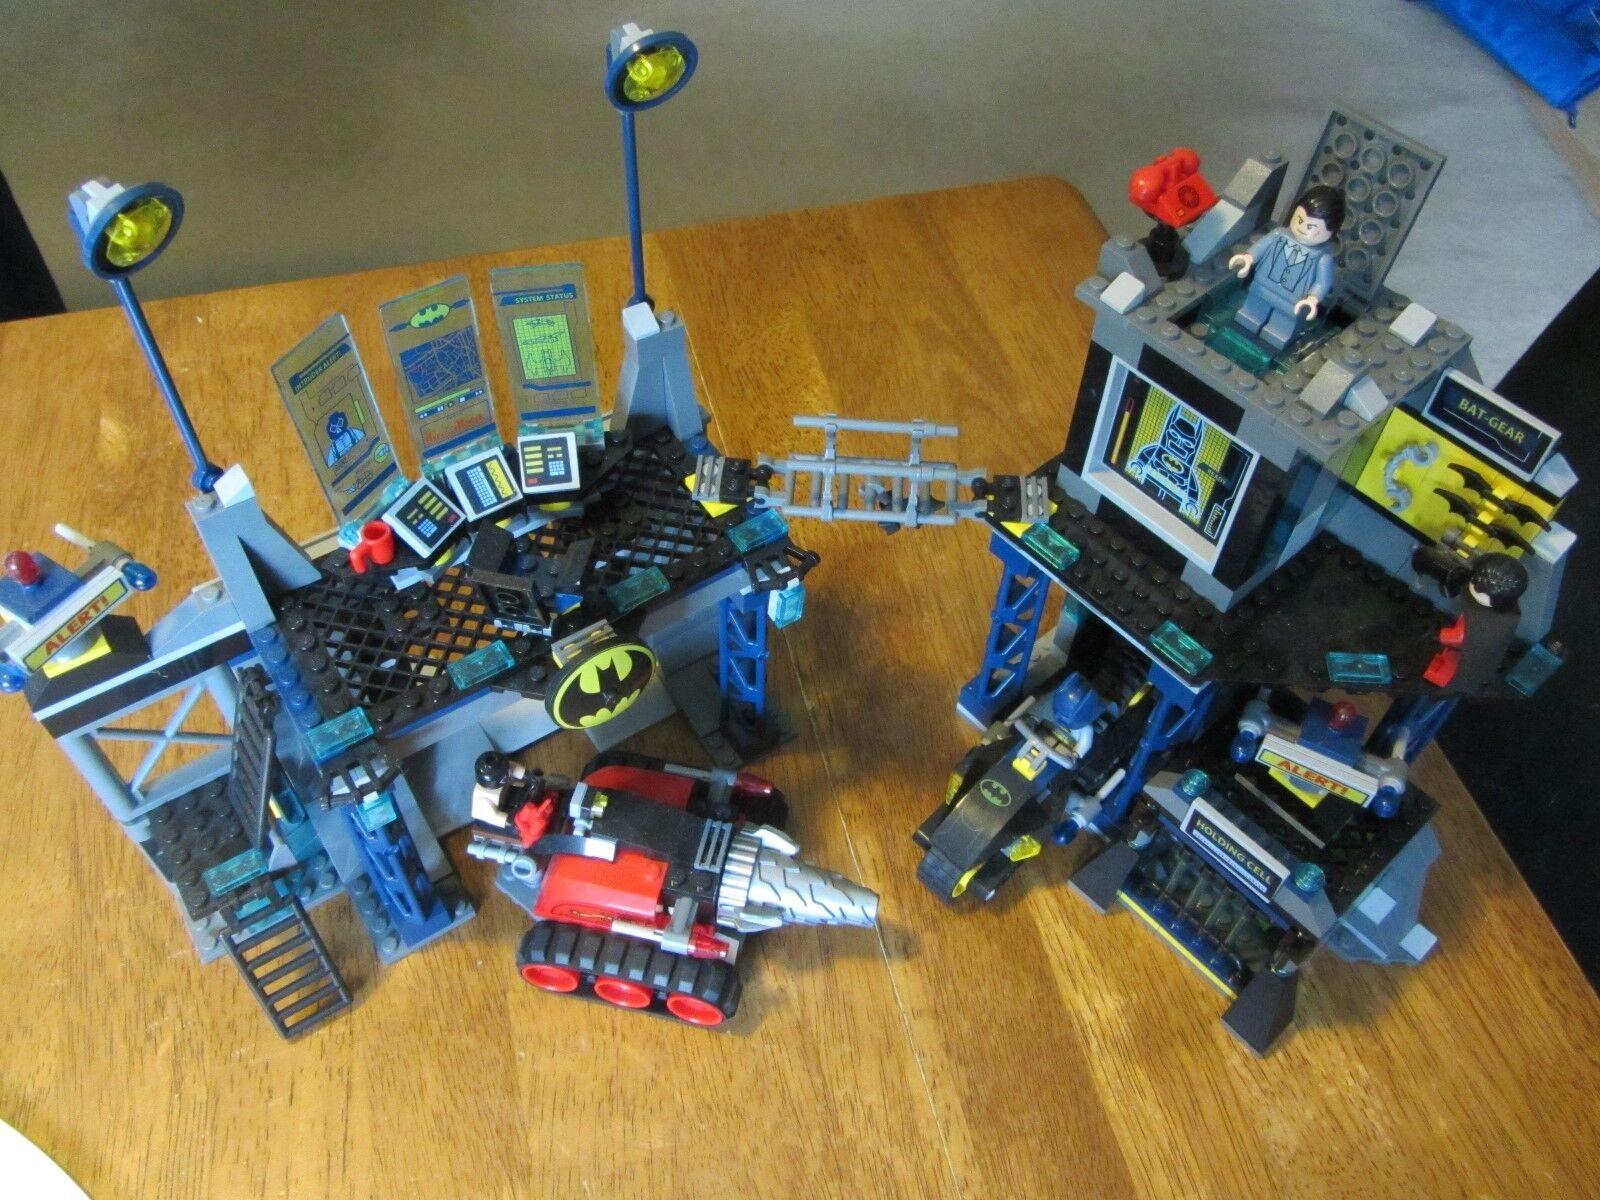 Lego set 6860 The Batcave